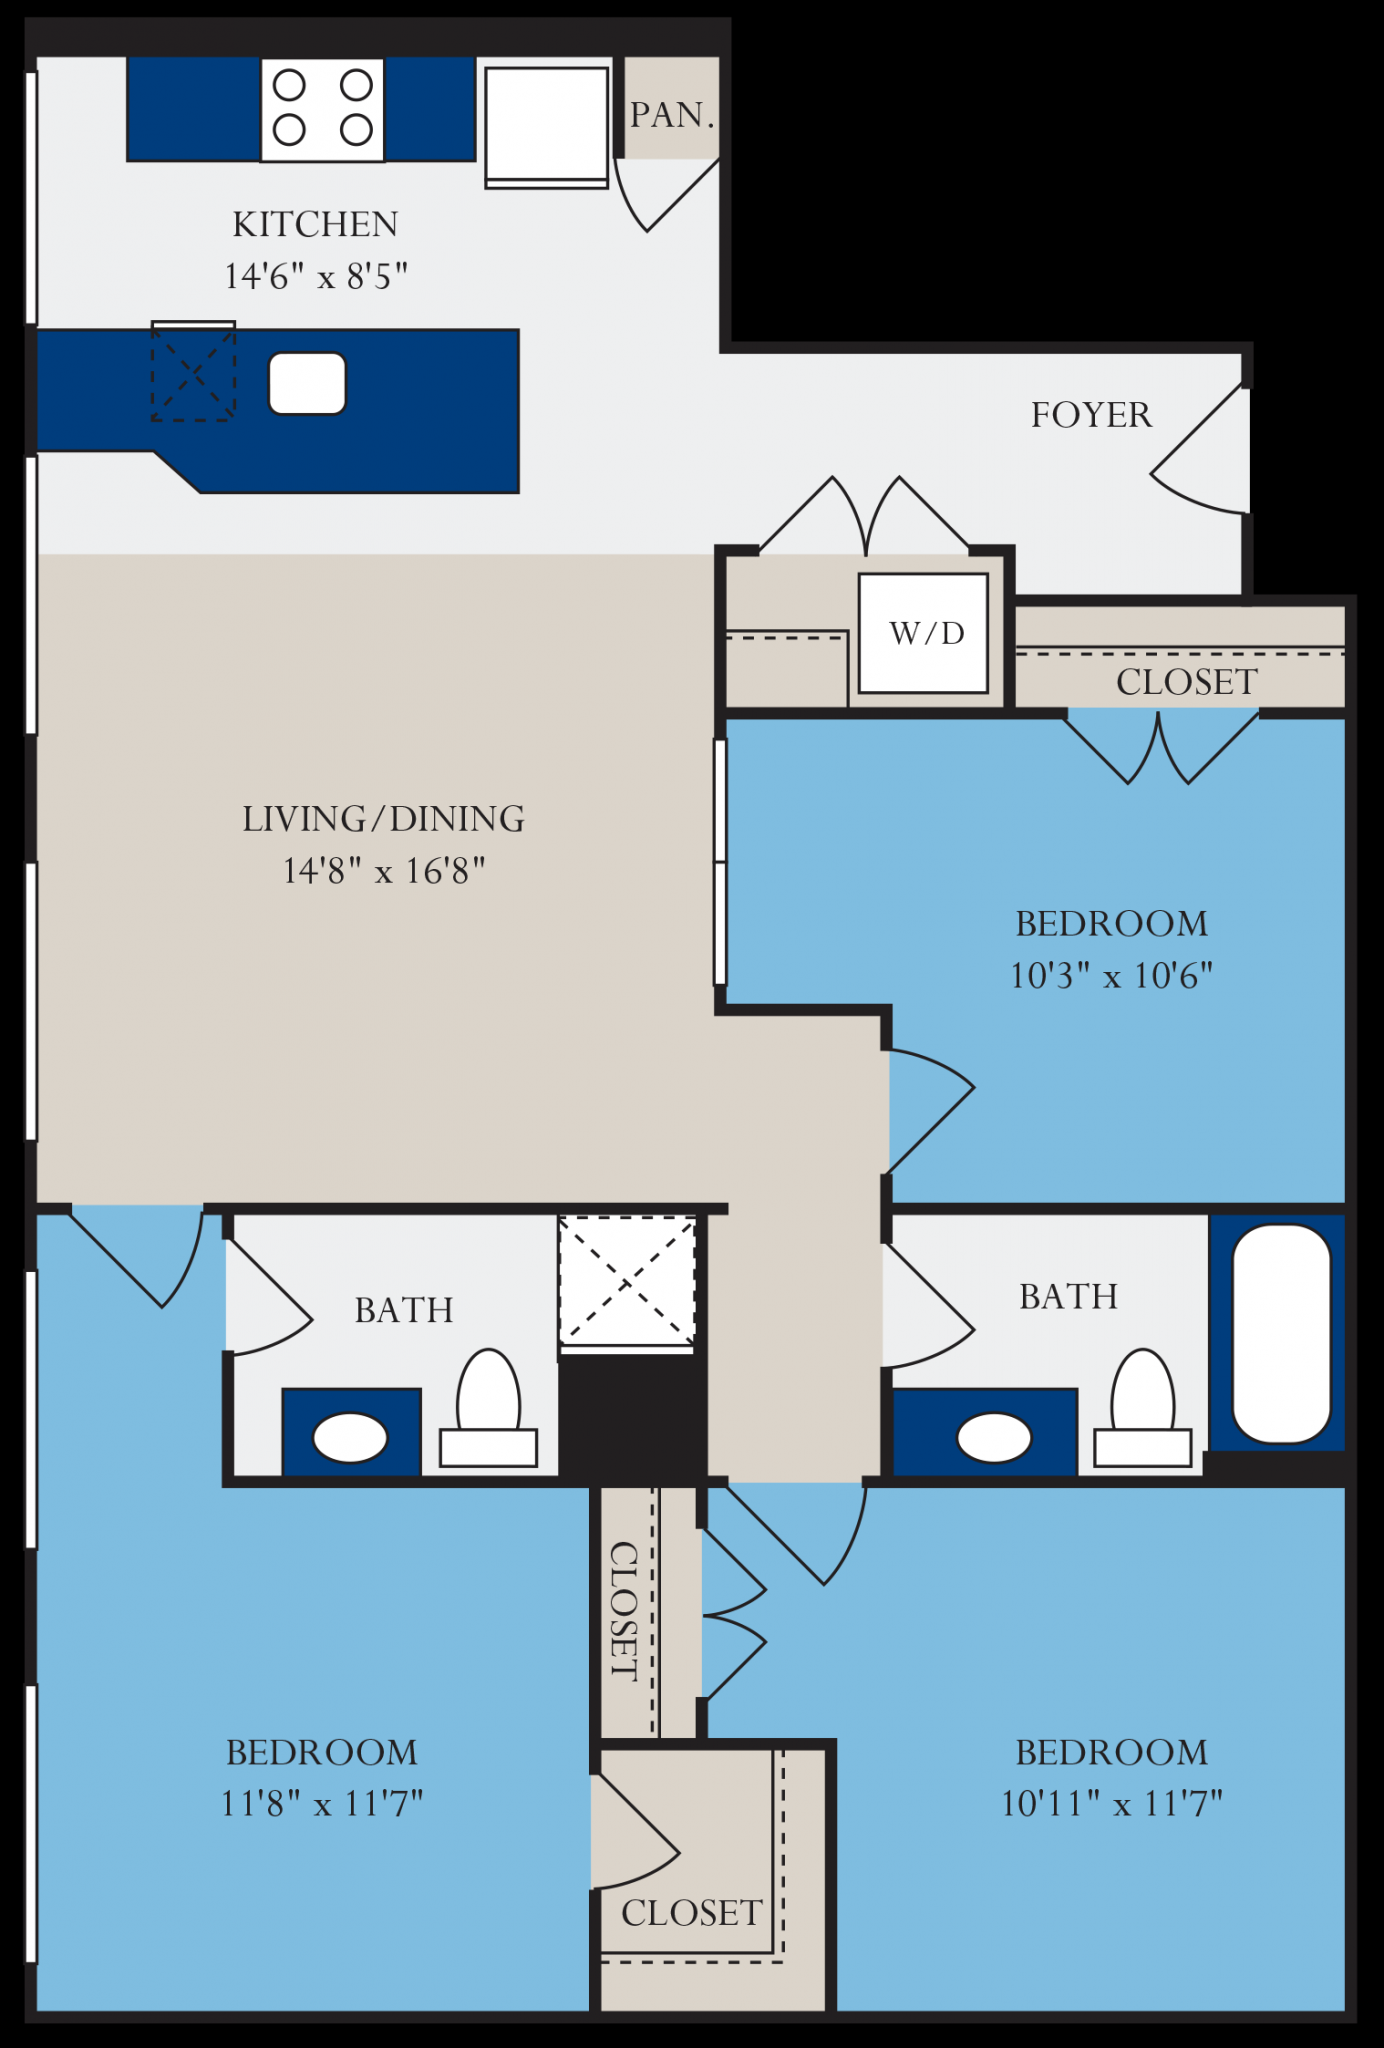 1 - 3 Bedroom Apartments - Spartanburg | Drayton Mills Lofts